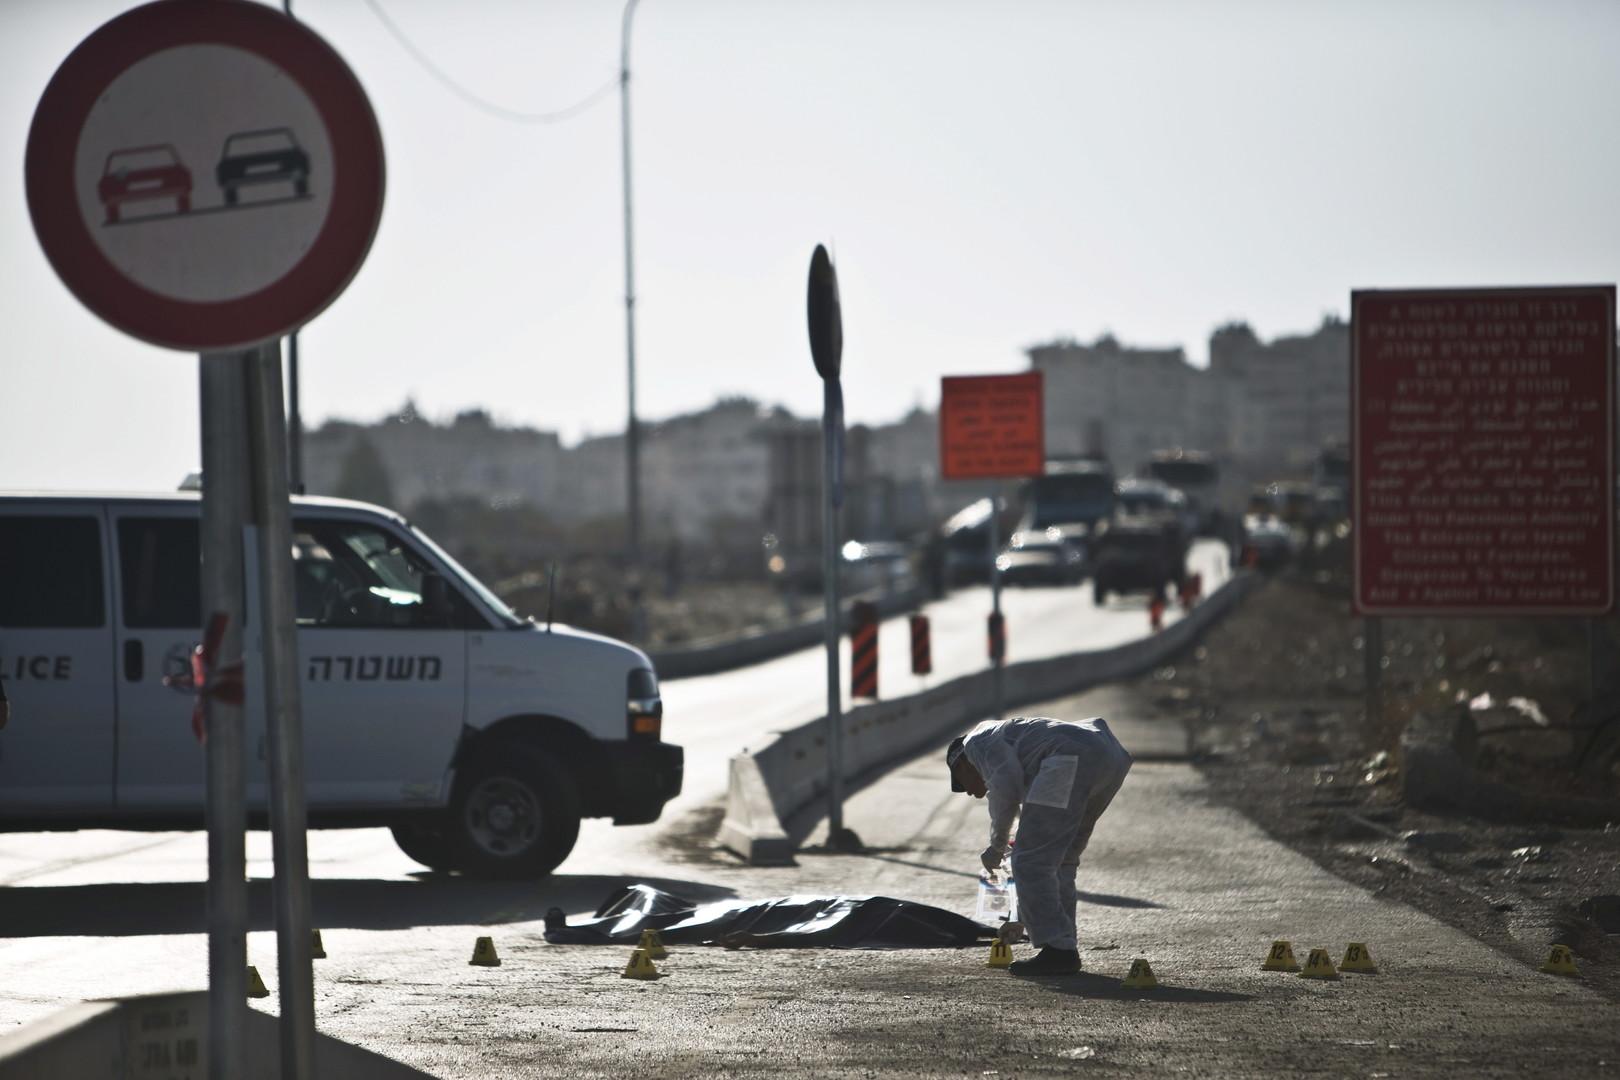 Opération anti-terroriste : un Israélien juif abattu par erreur à Jérusalem